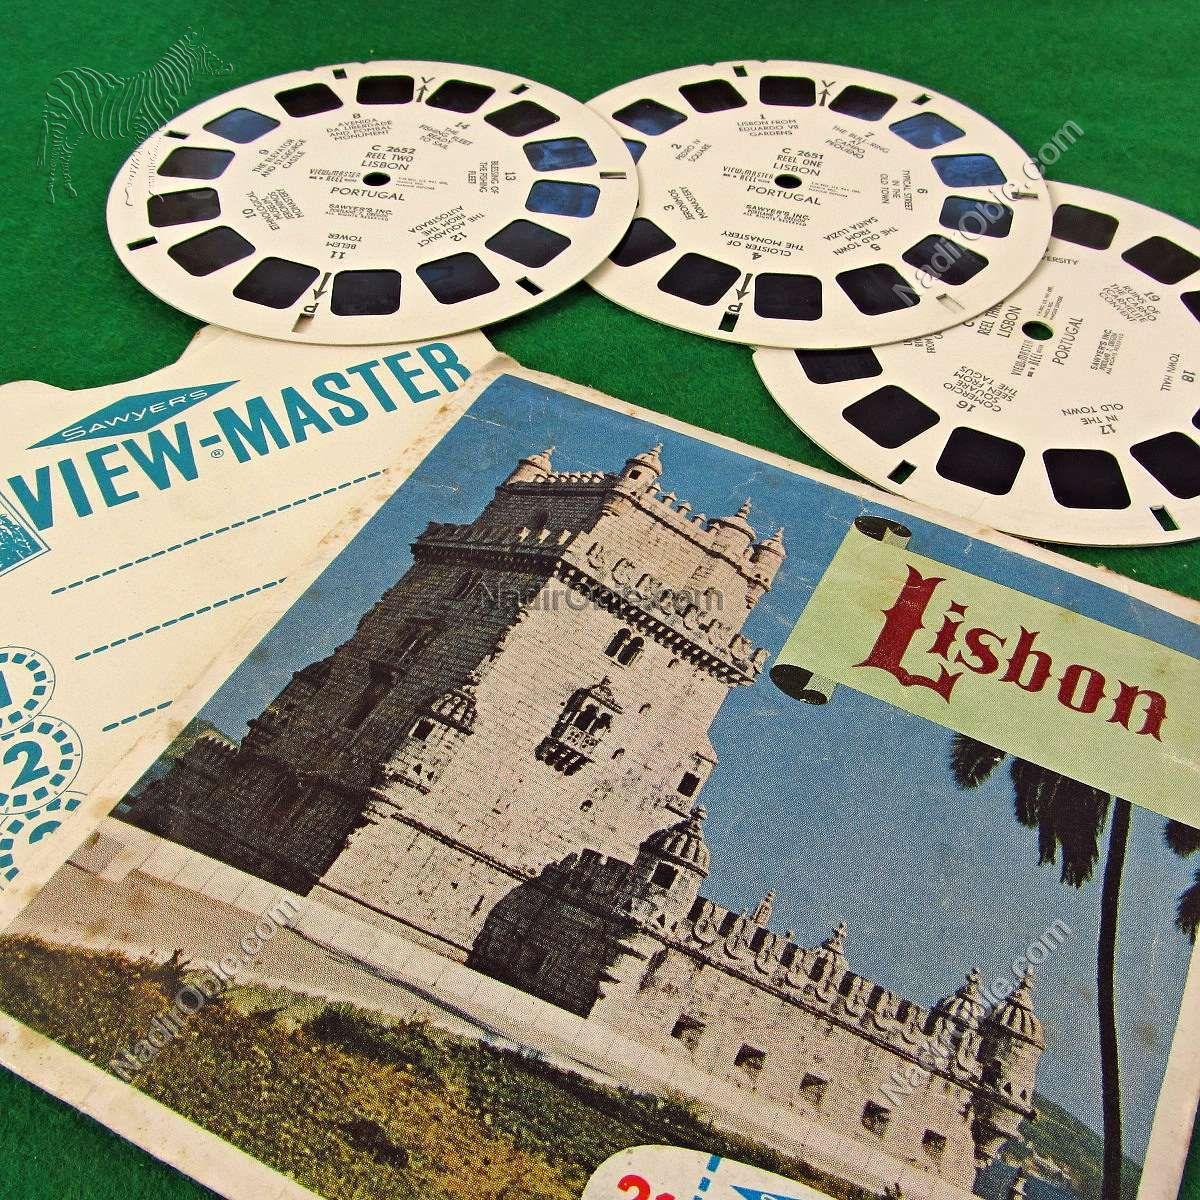 Lisbon View-Master Film Diğer Objeler 3Boyutlu